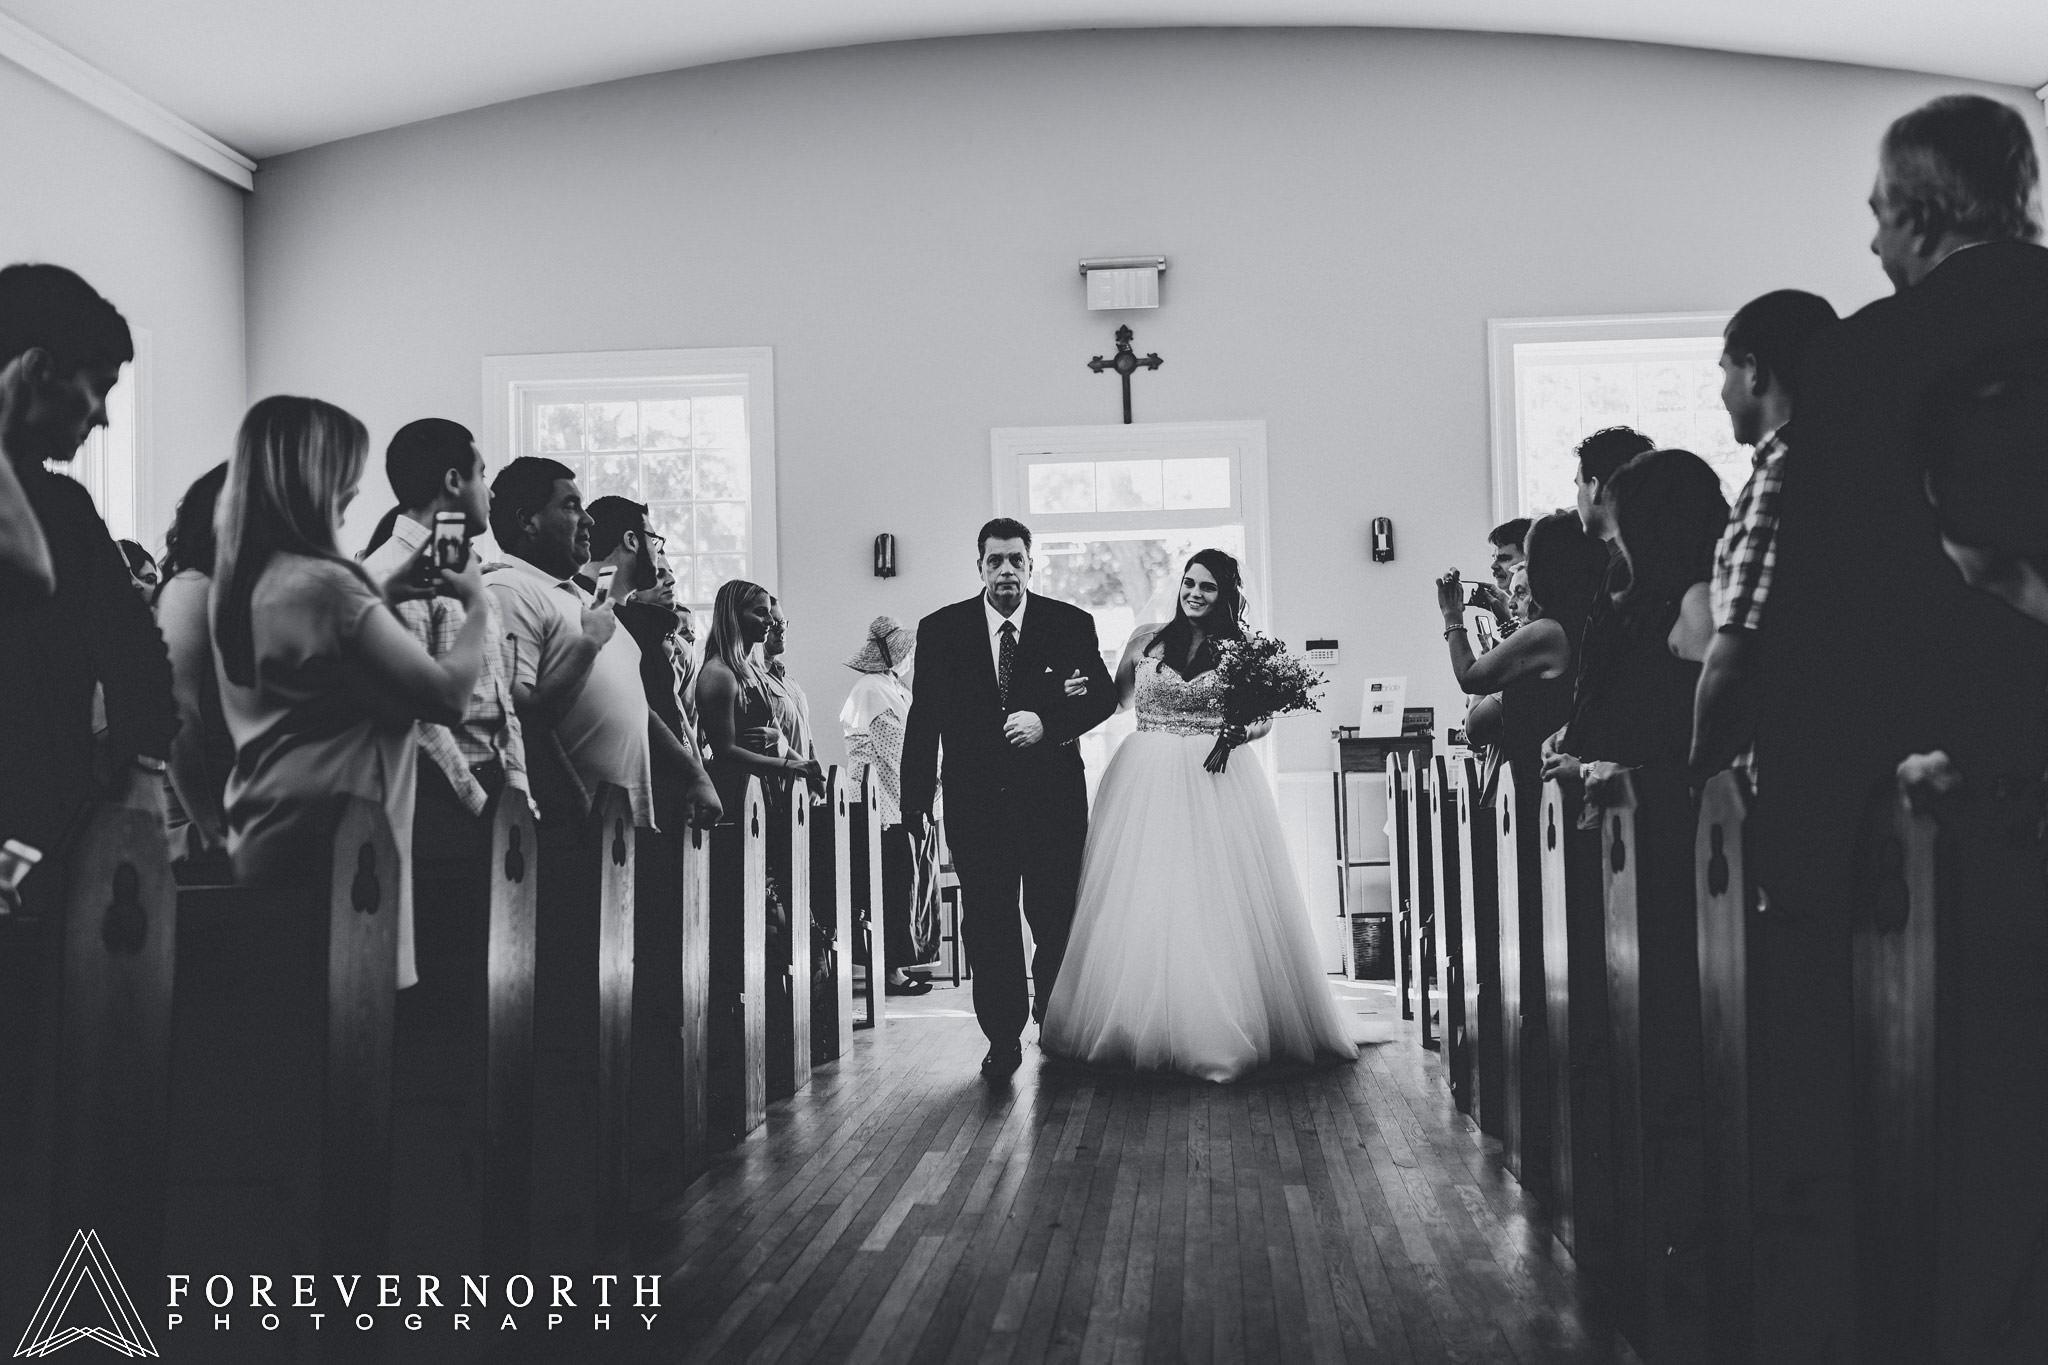 Brown-Allaire-State-Park-Wedding-Photographer-16.JPG